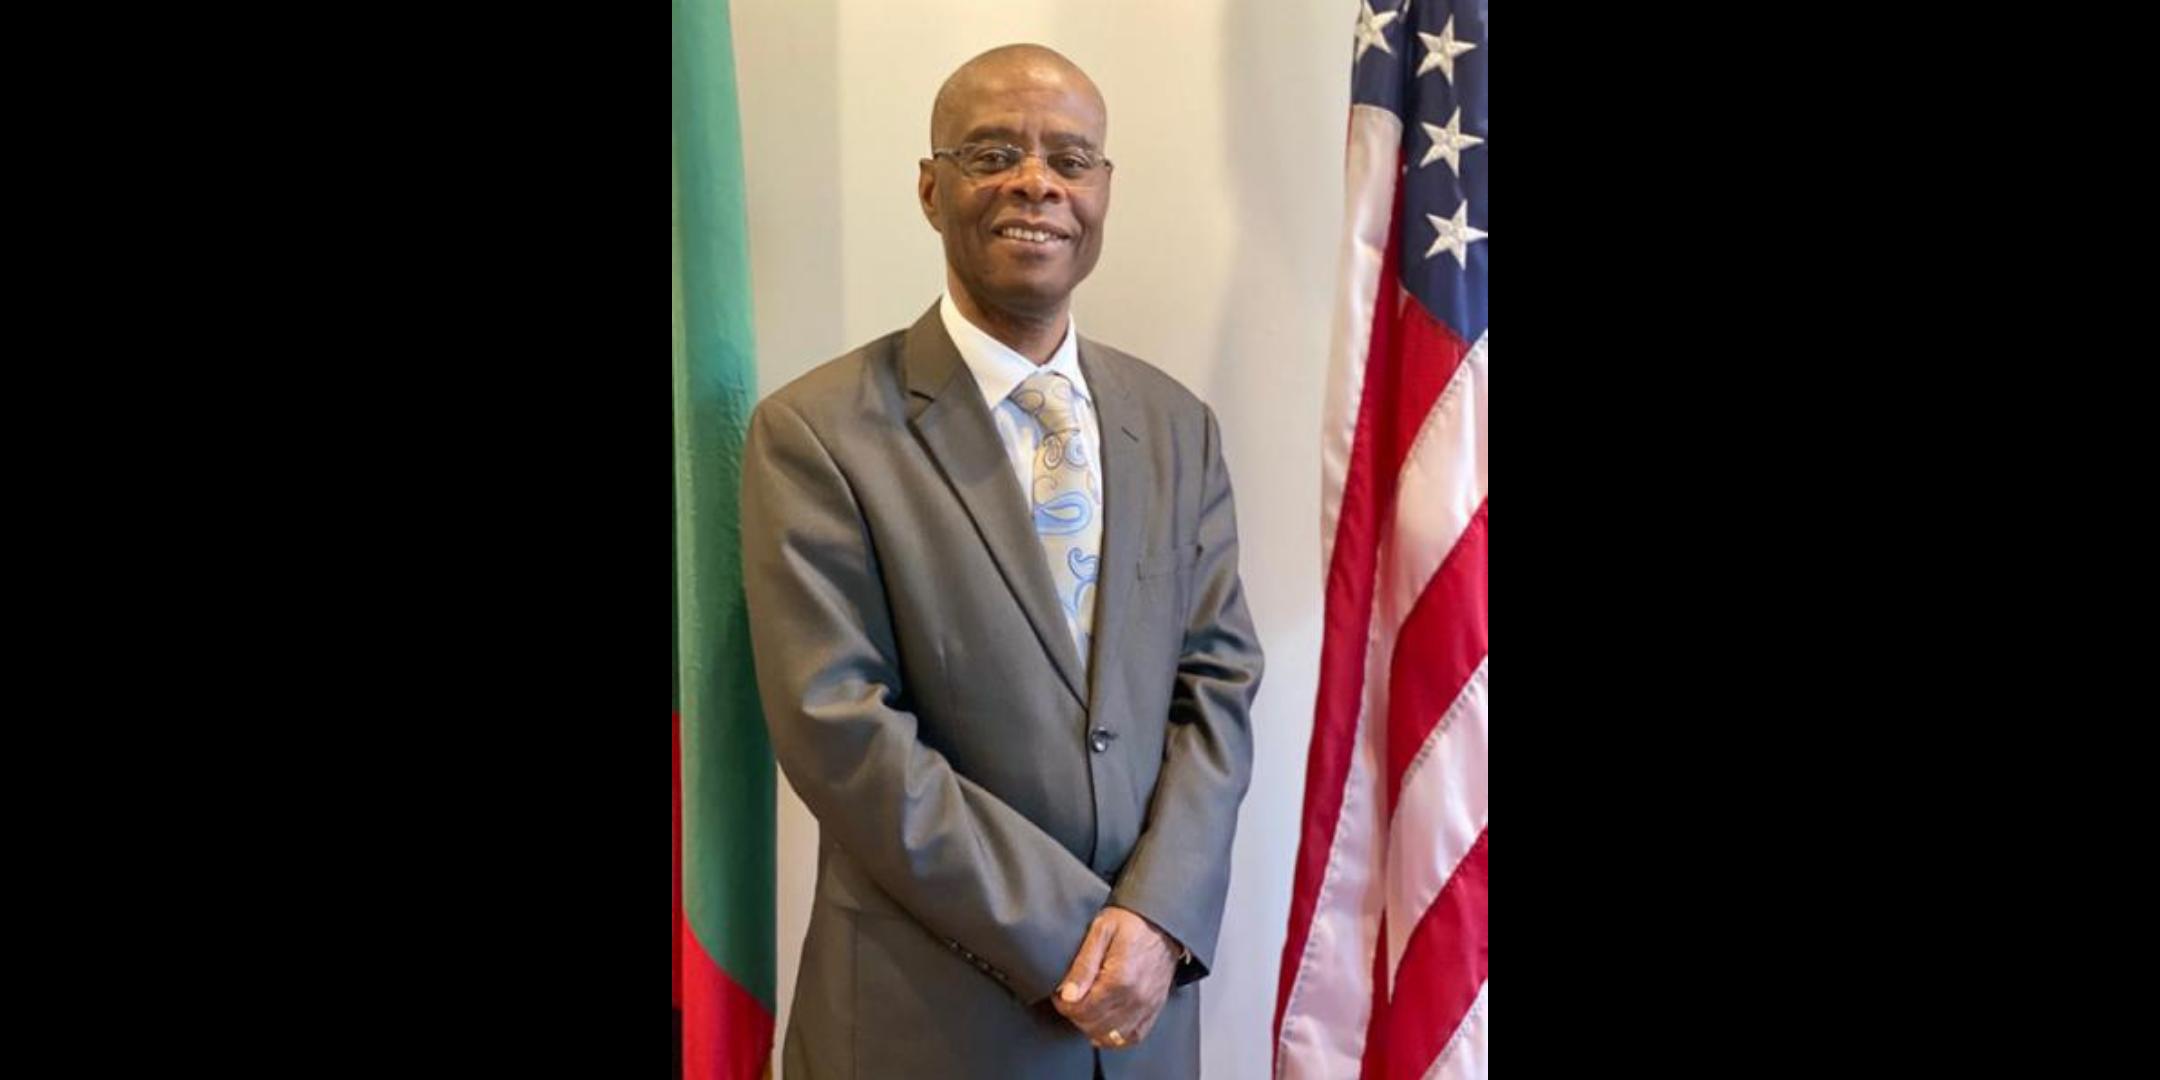 His Excellency Lazarous Kapambwe Ambassador of Zambia to the U.S.